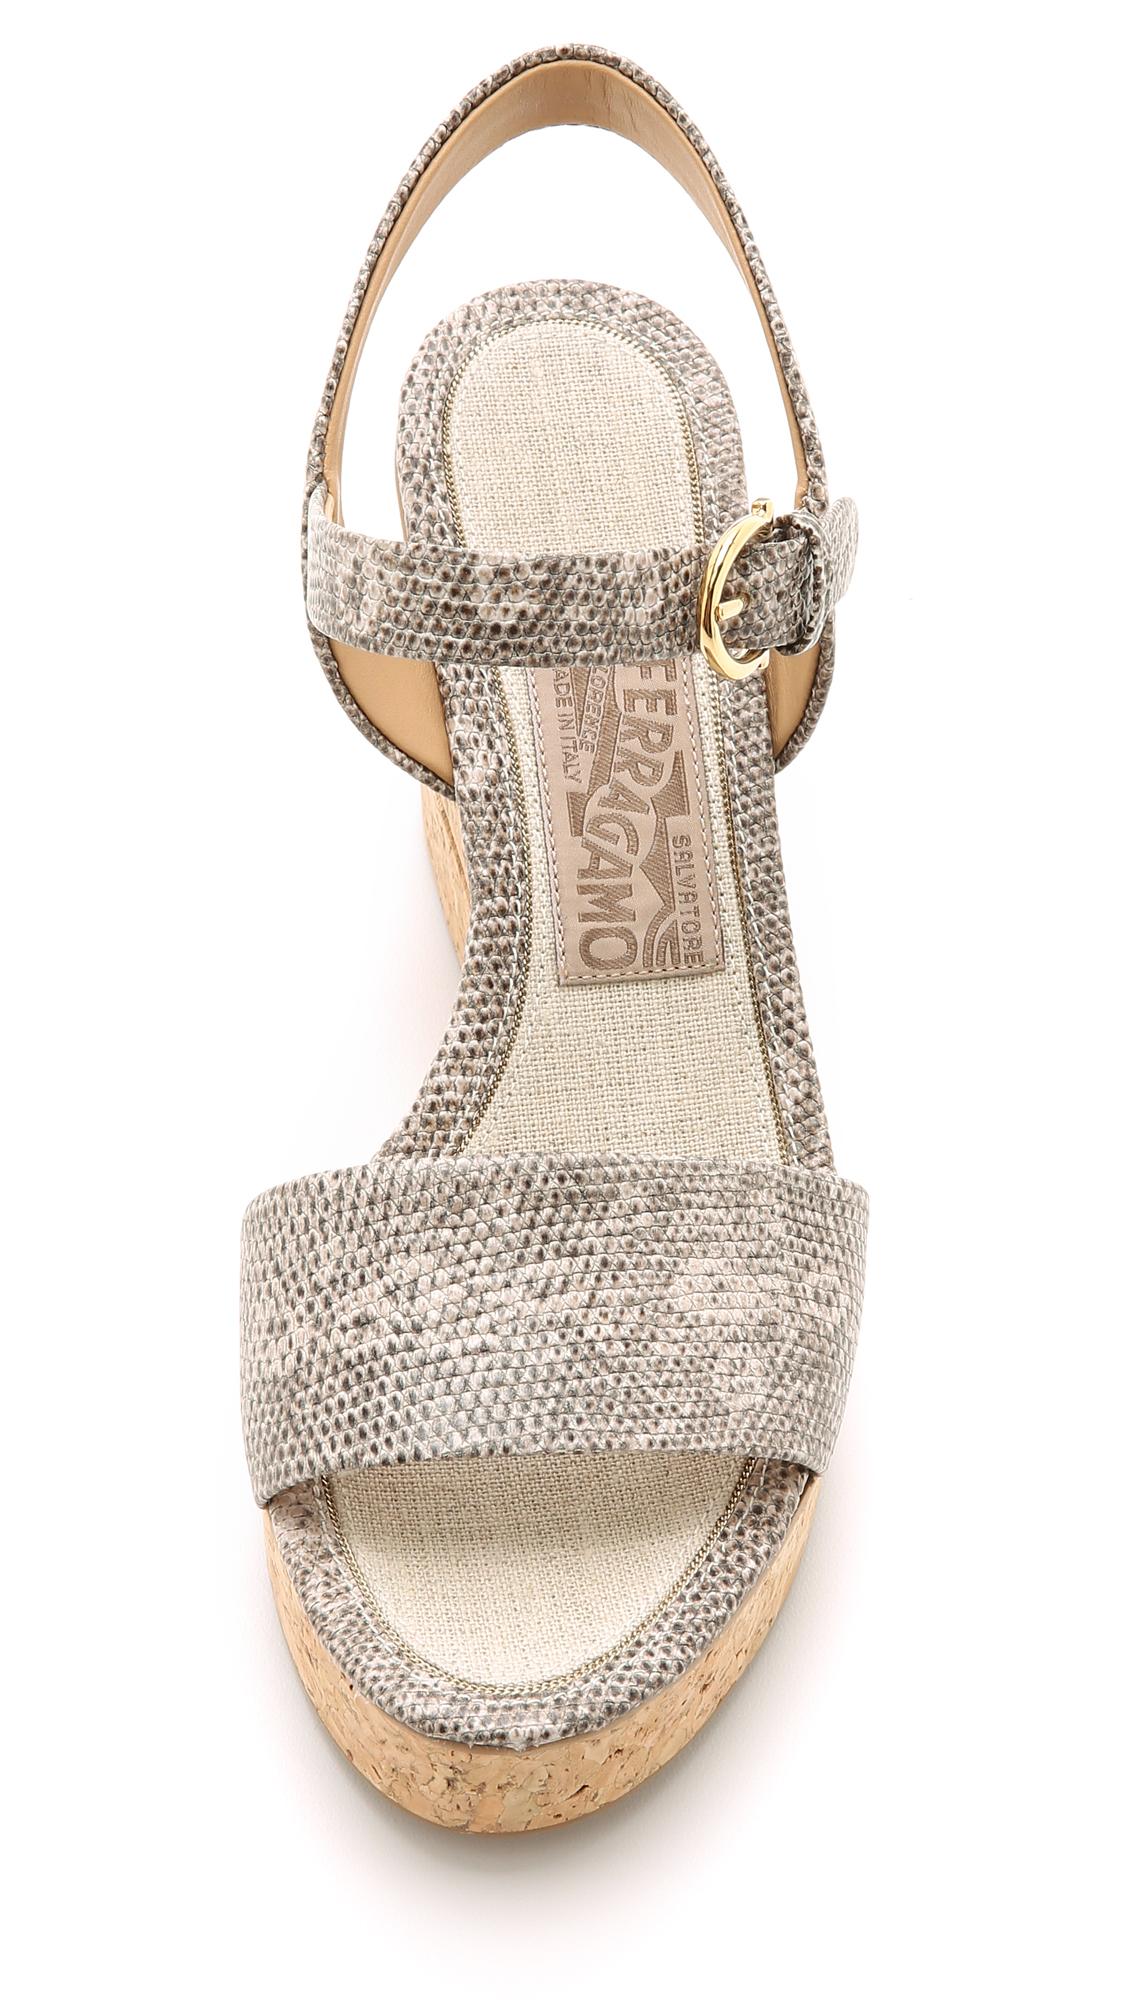 66ef6592876 Lyst - Ferragamo Madea Wedge Sandals - Roccia in Gray